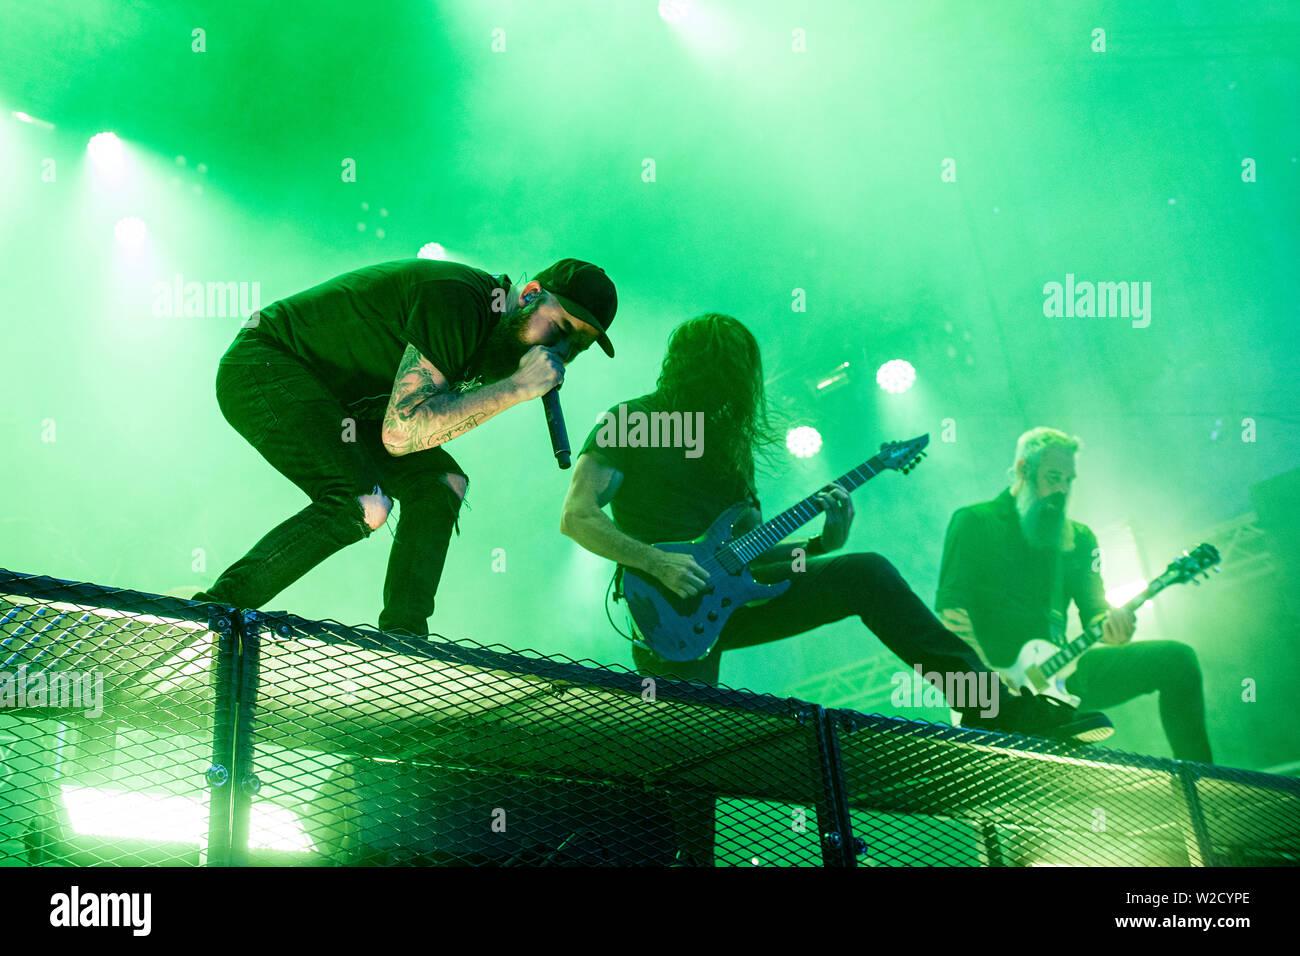 Swedish Music Stock Photos & Swedish Music Stock Images - Alamy